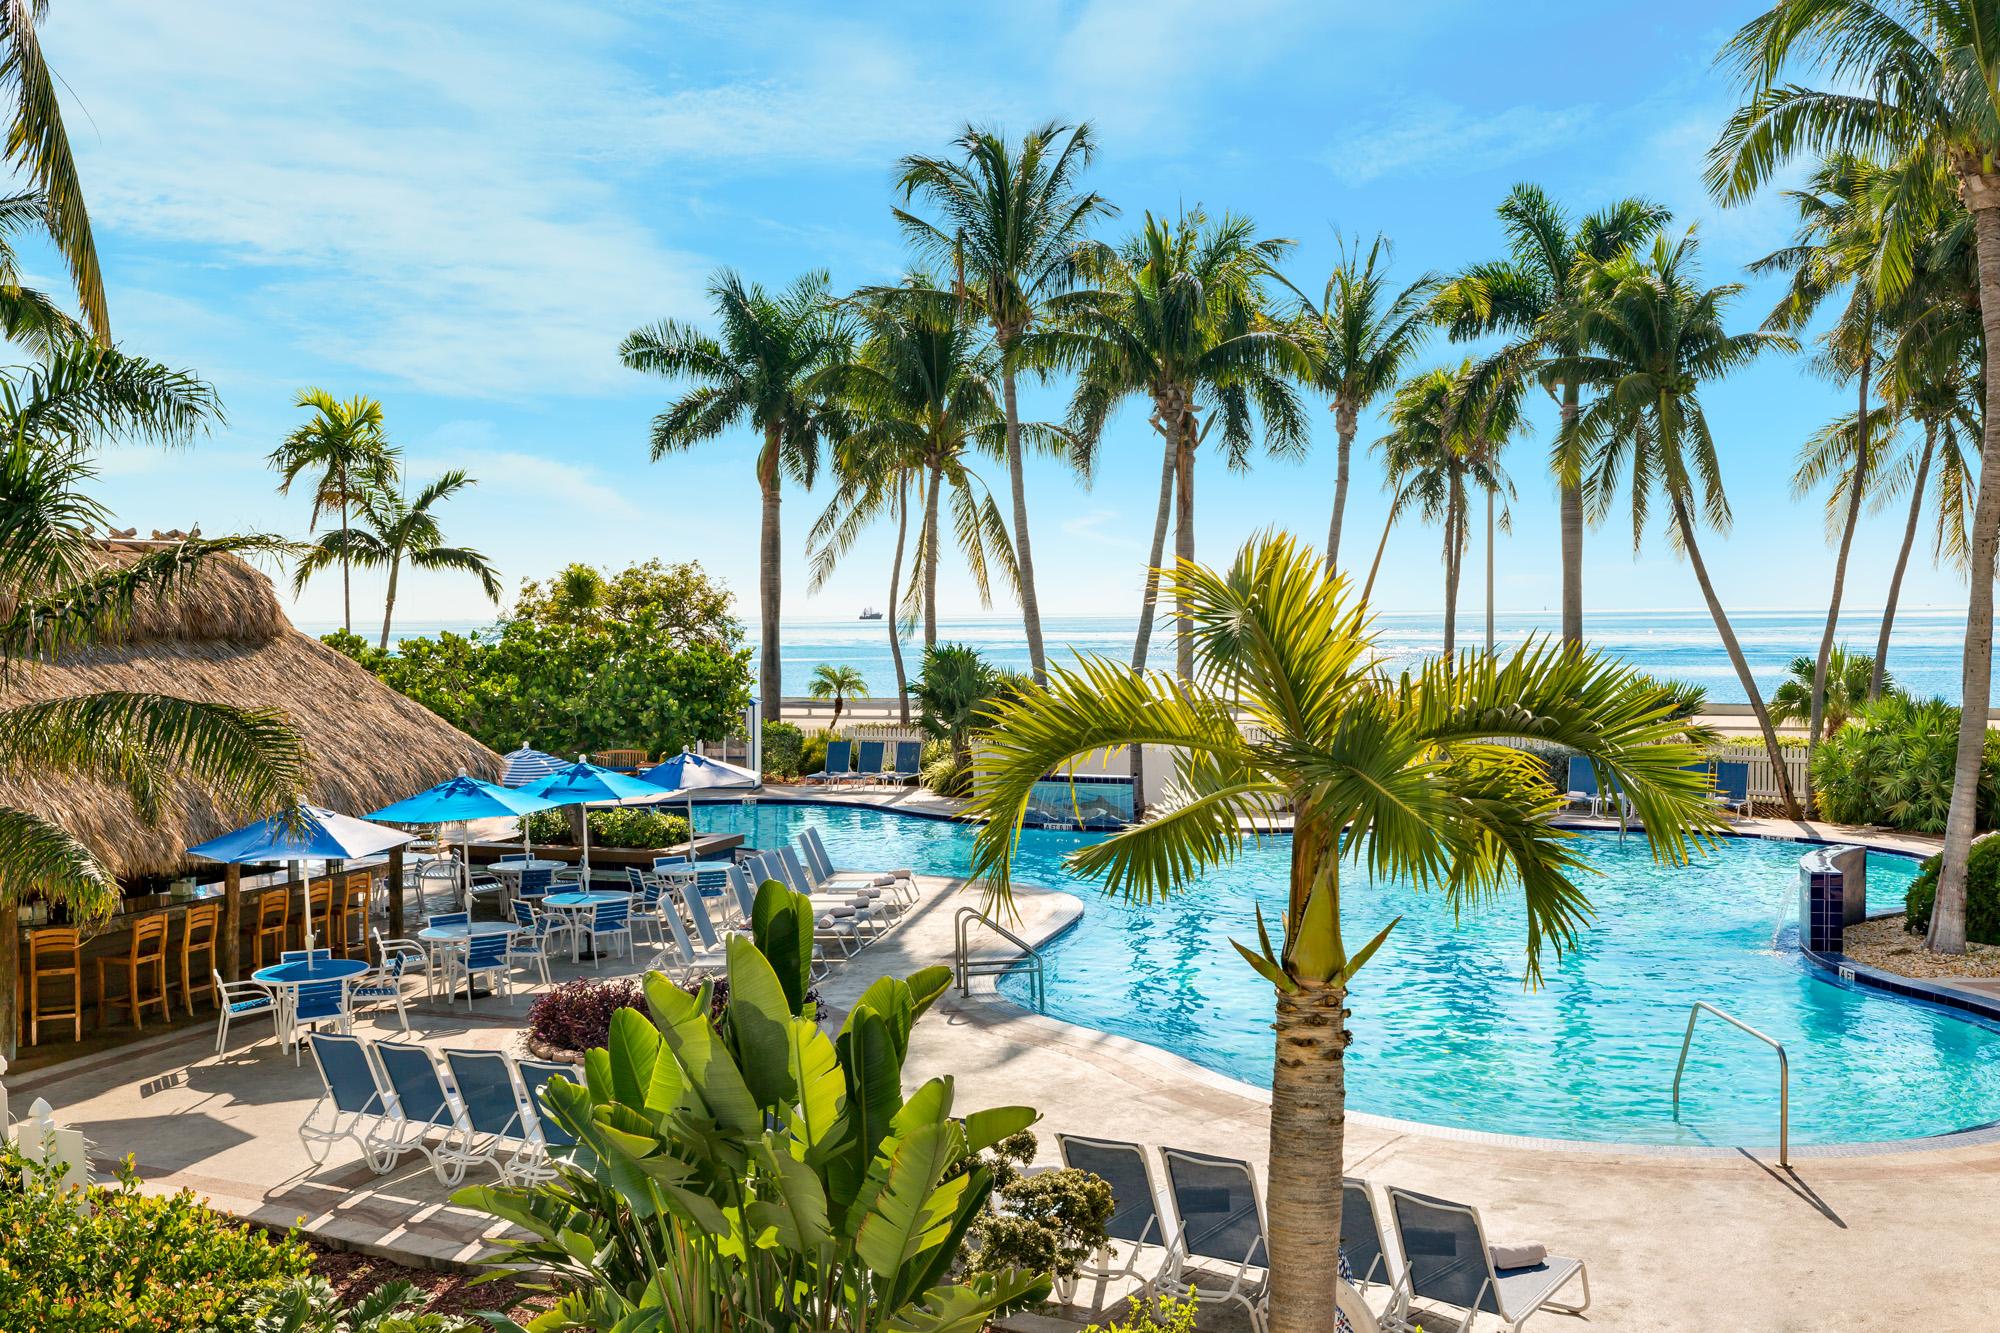 Key West Resorts >> Hotels Resorts In Key West Fl Key West Attractions Association